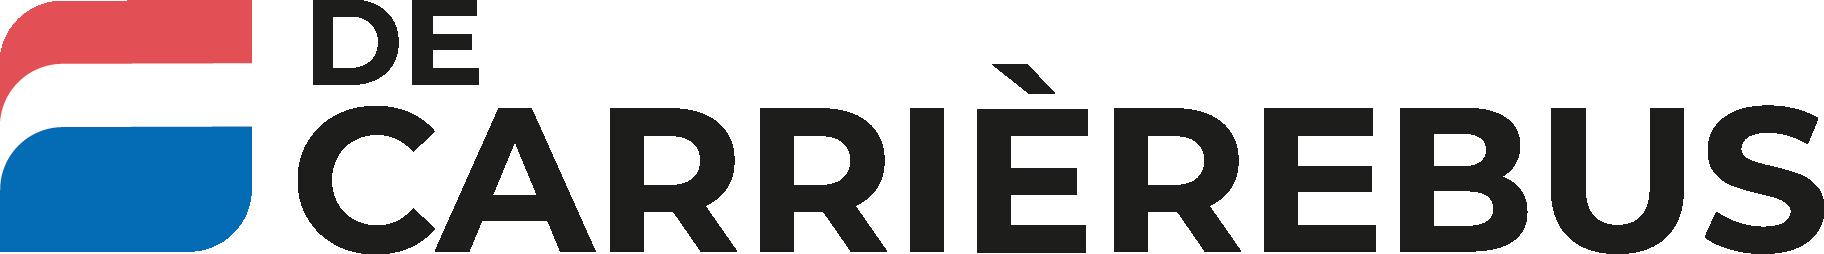 De Carrièrebus logo